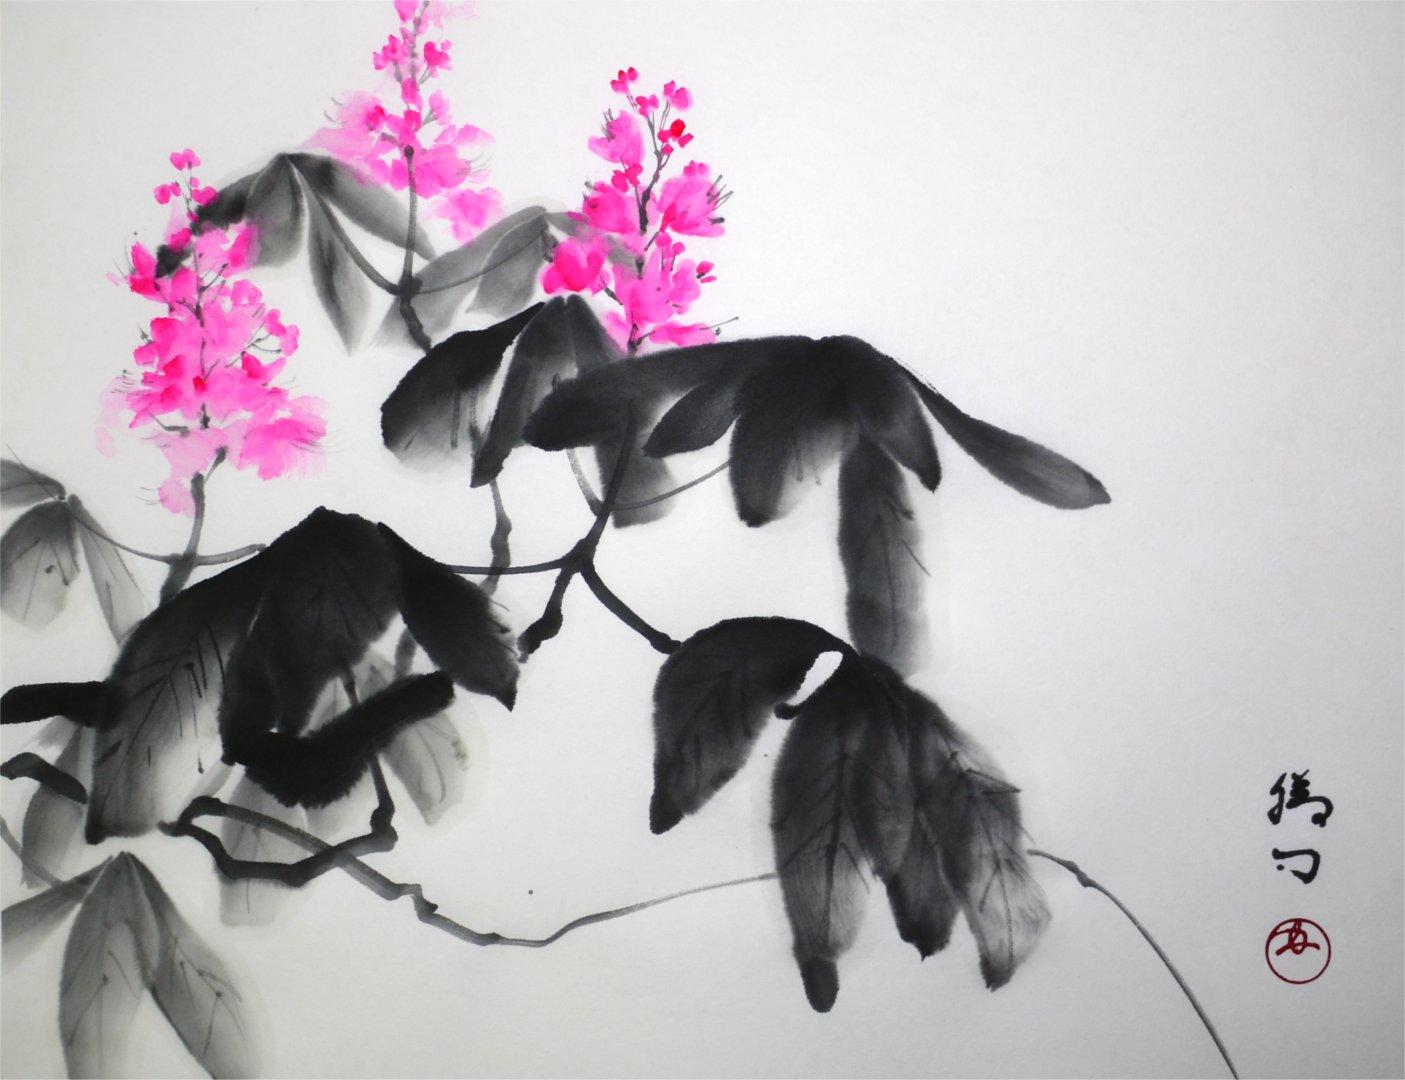 彩墨画「栃の木」福田勝司筆